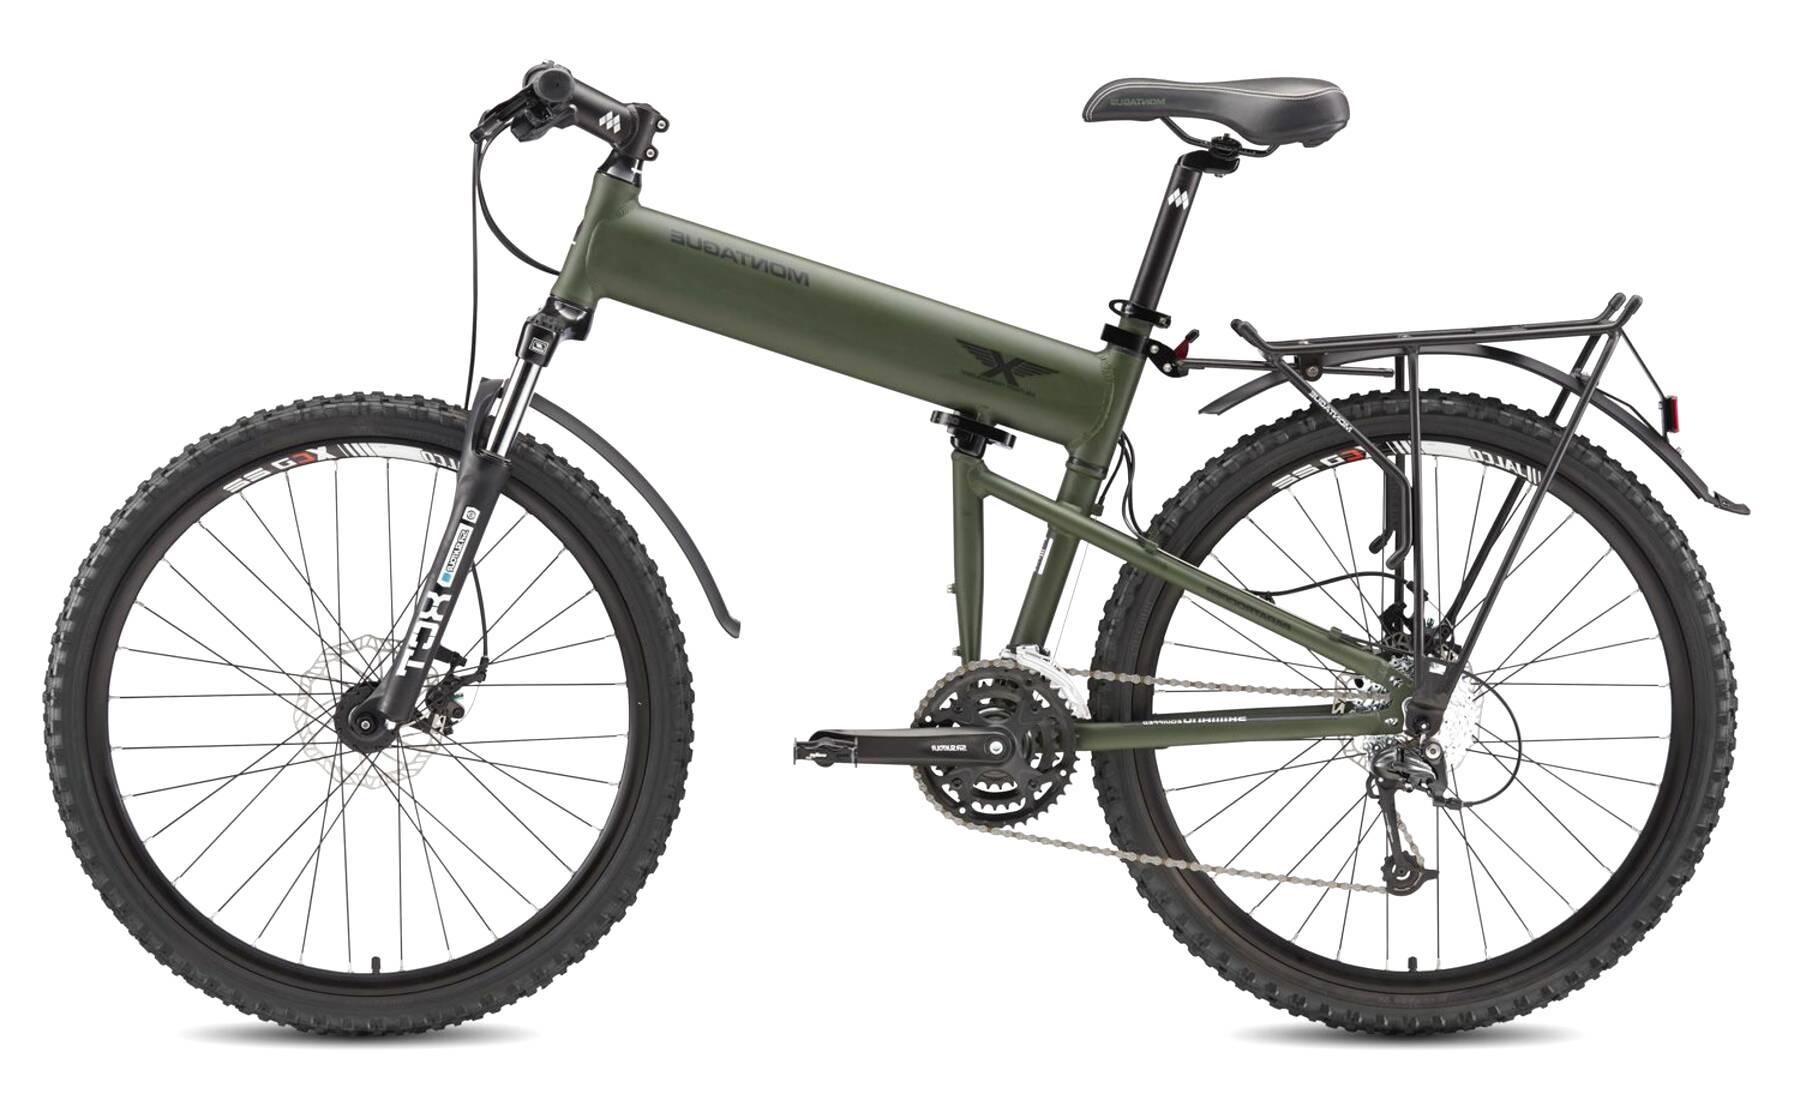 montague folding bike for sale